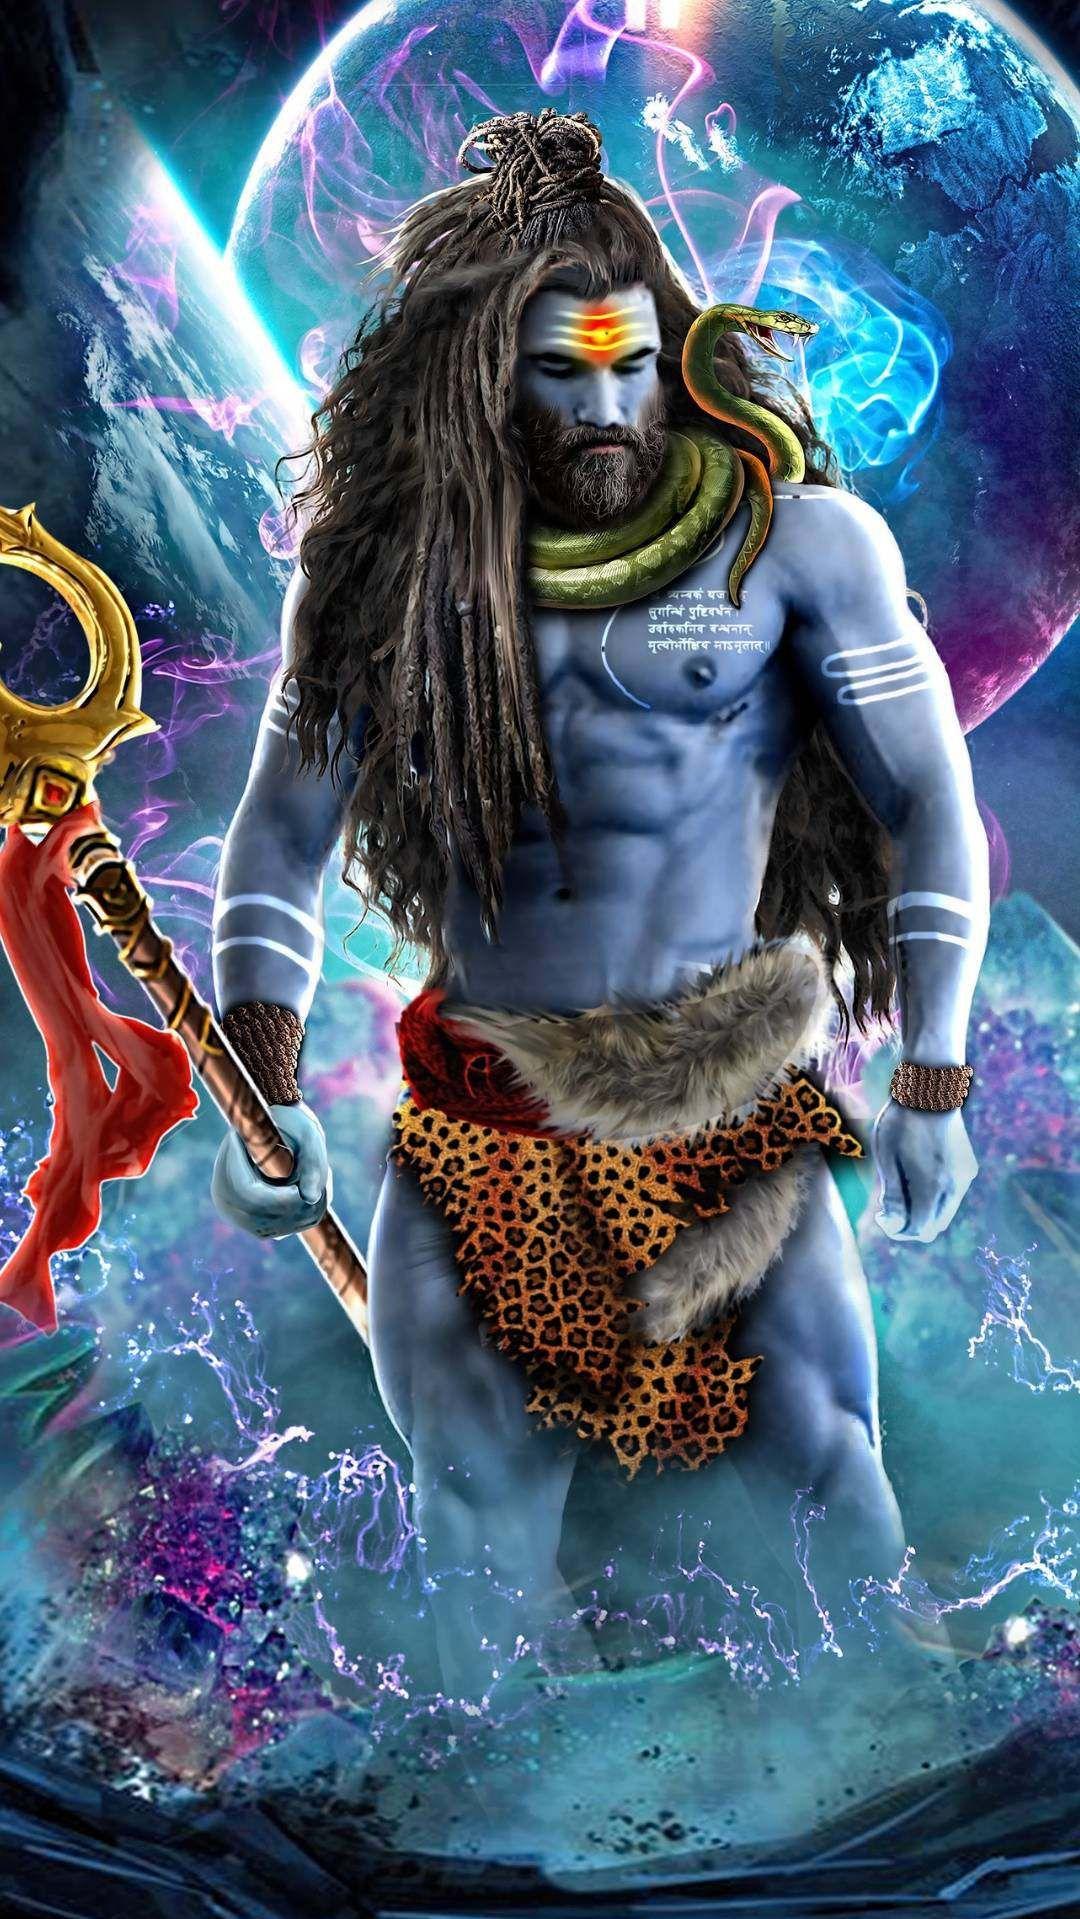 Midnight Highway Artistic Iphone Wallpaper Iphone Wallpapers Shiva Art Angry Lord Shiva Shiva Lord Wallpapers